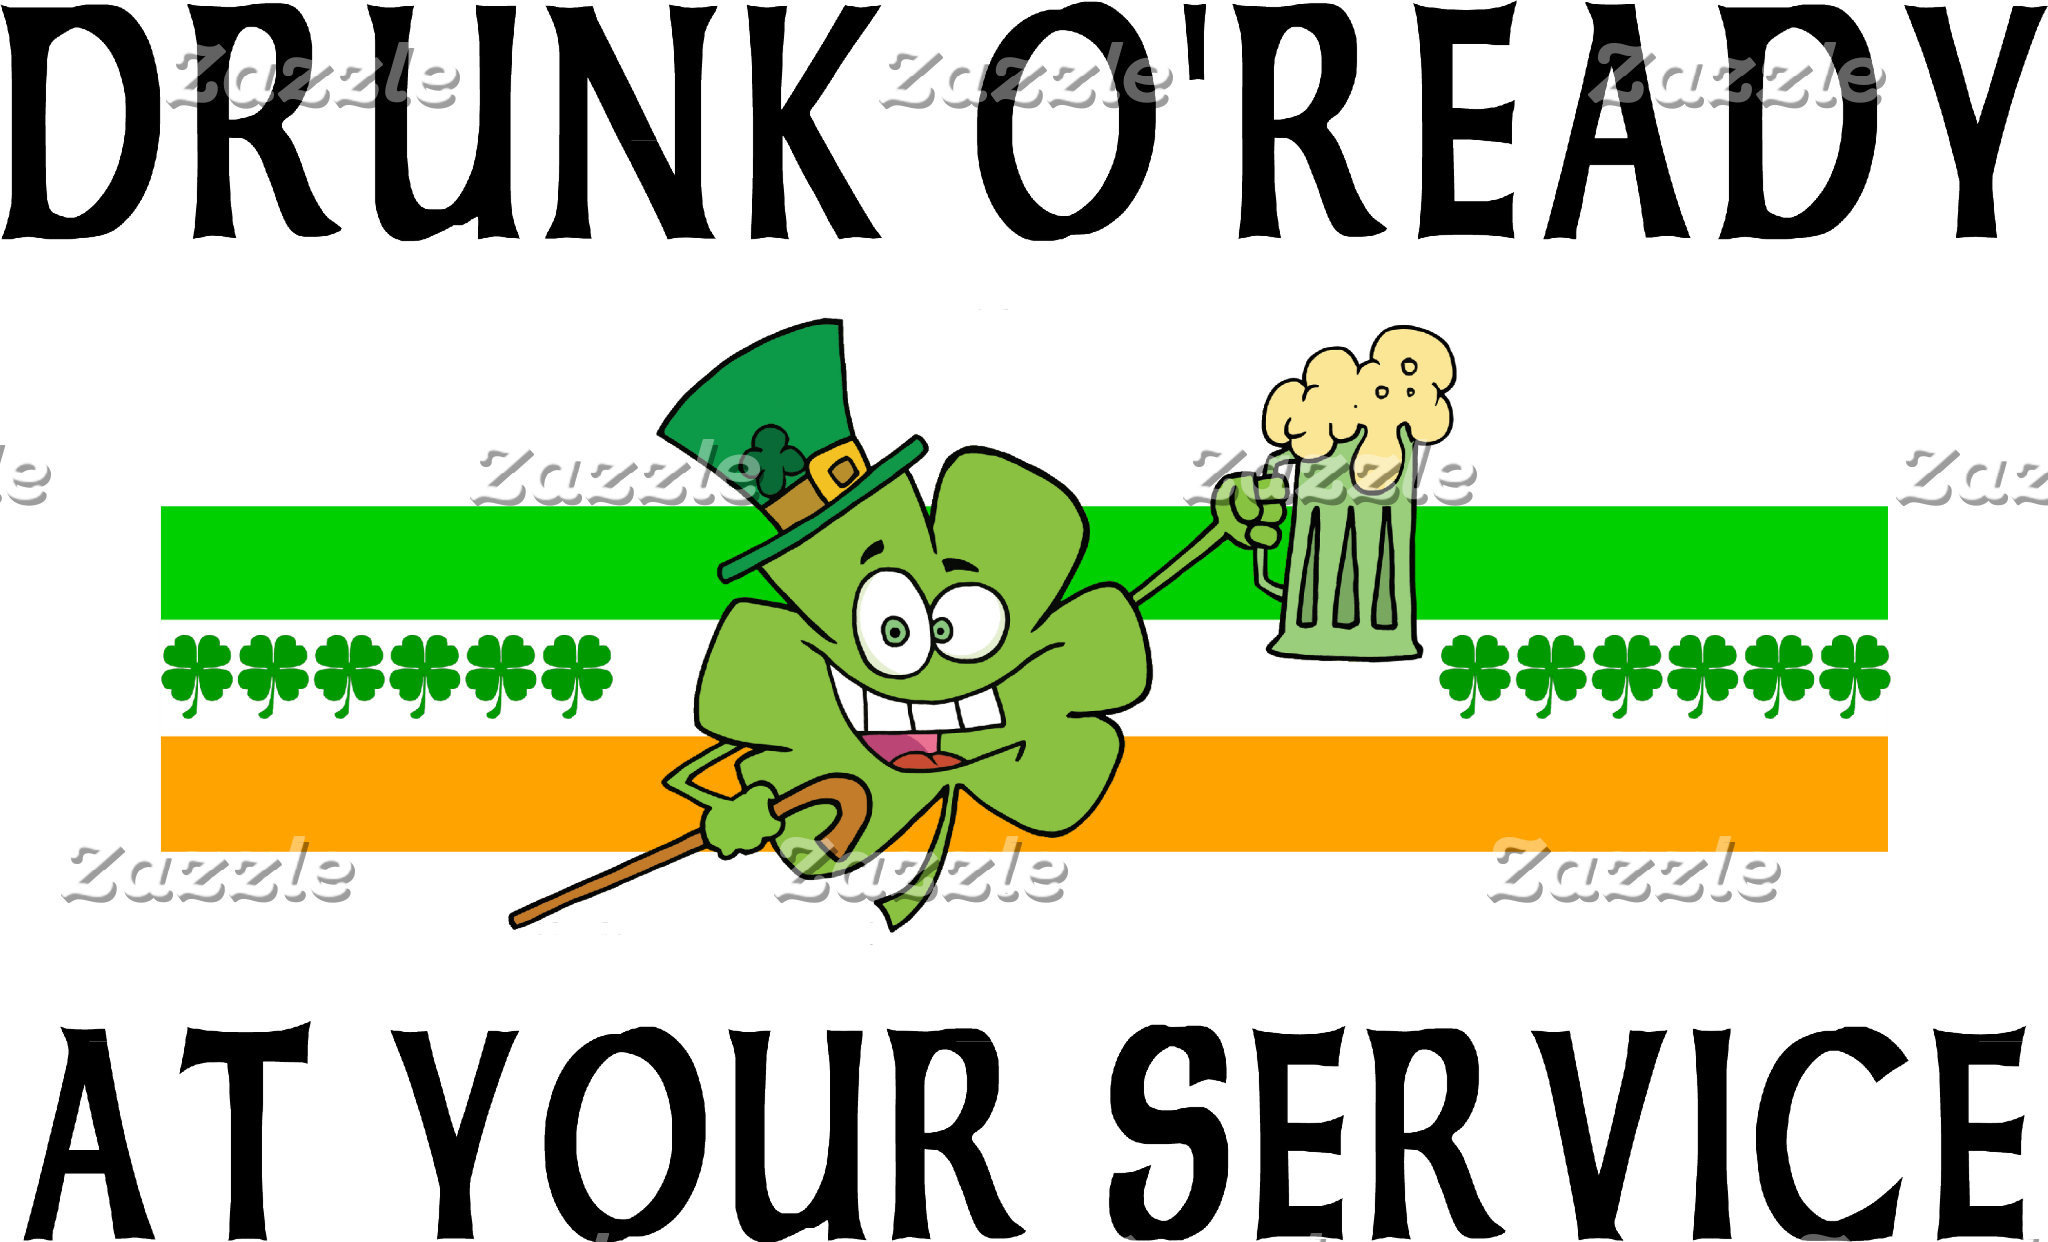 Funny Drunk Irish T-Shirt Gifts